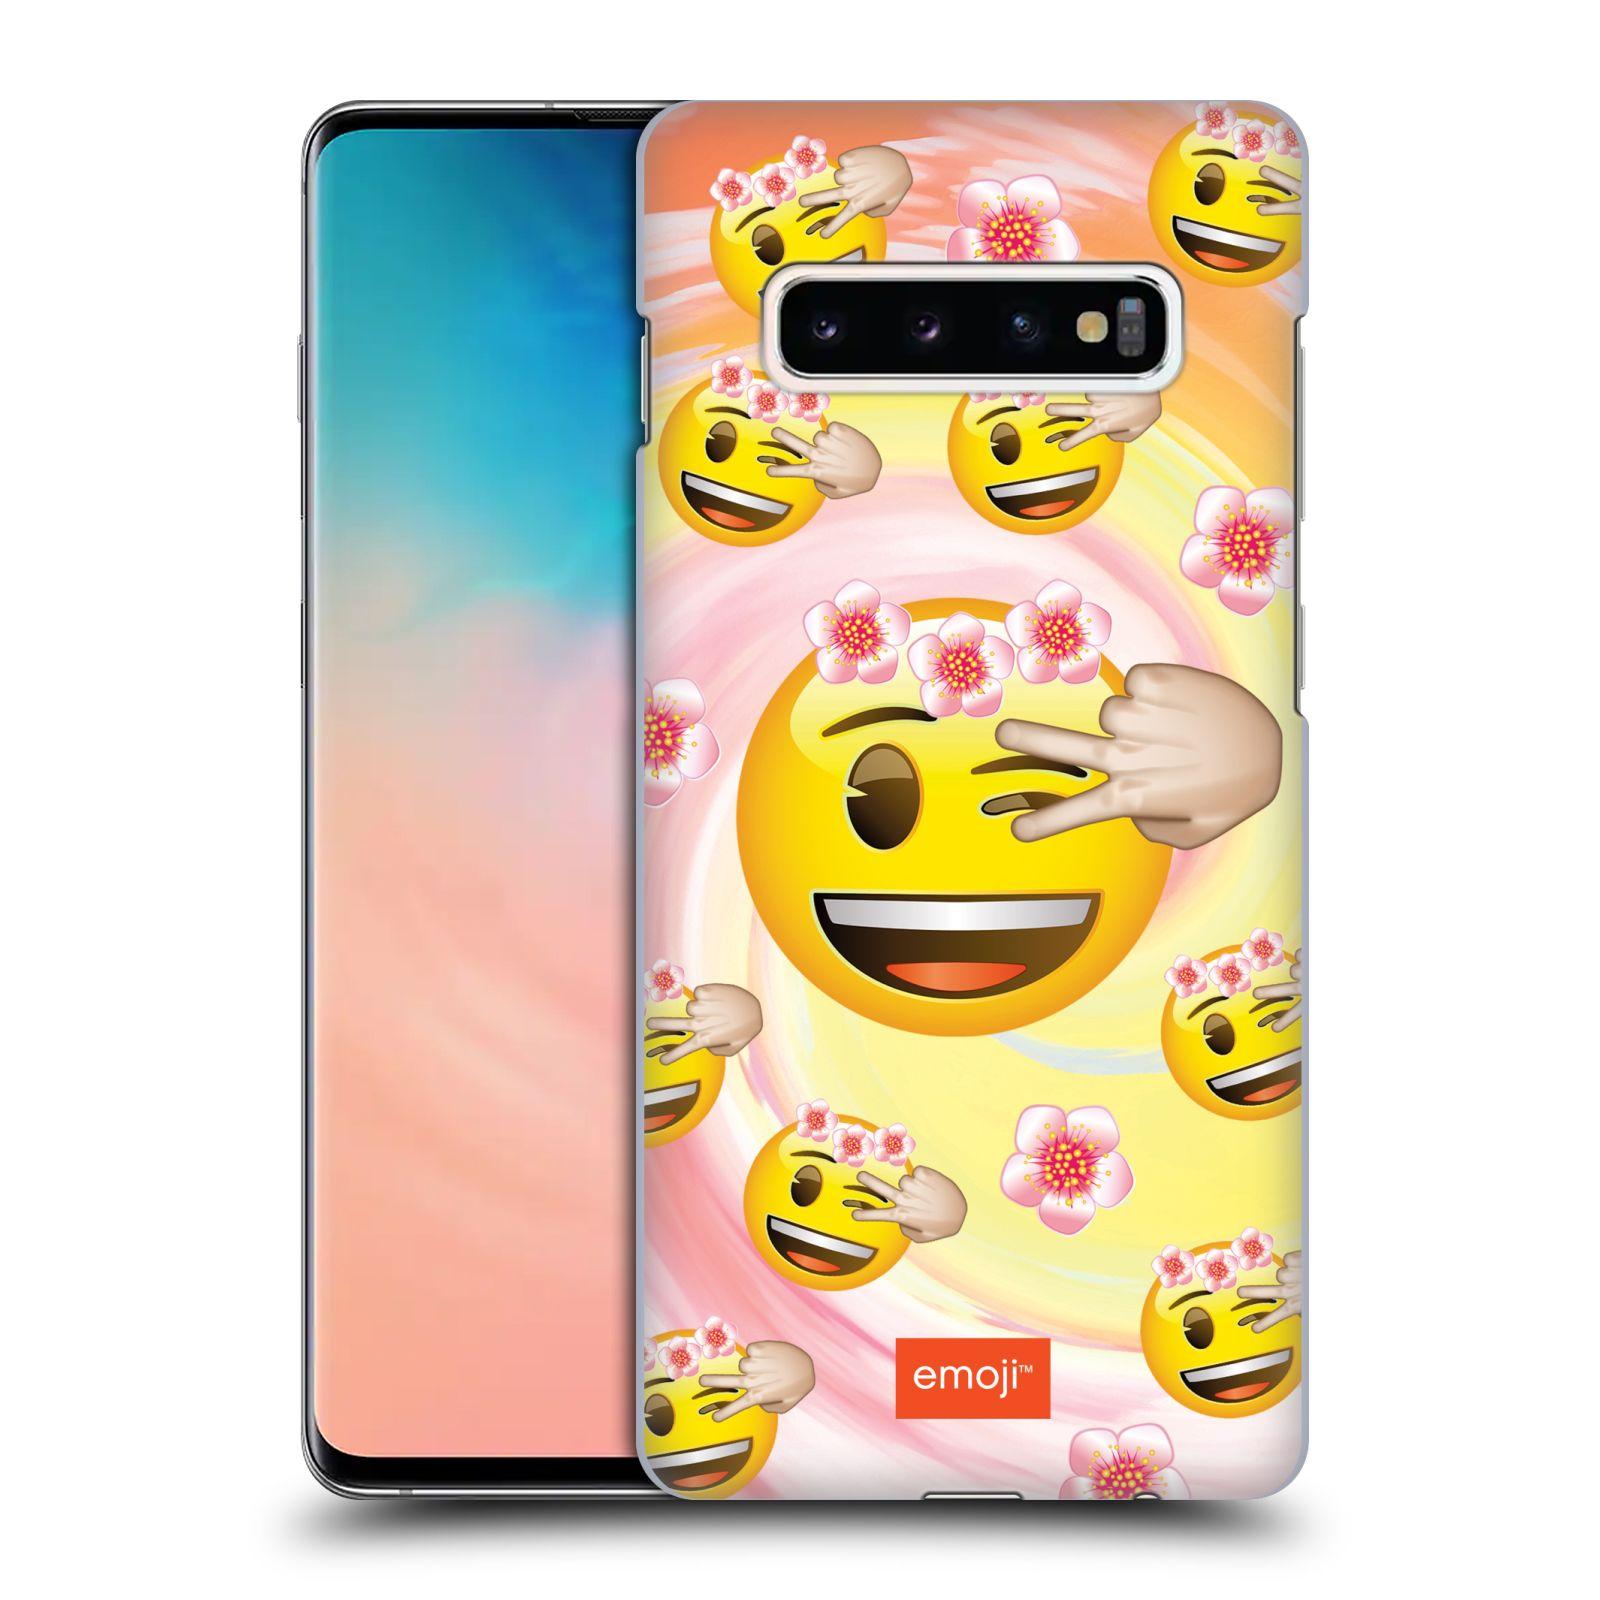 Plastové pouzdro na mobil Samsung Galaxy S10 Plus - Head Case - EMOJI - Mrkající smajlíci a kytičky